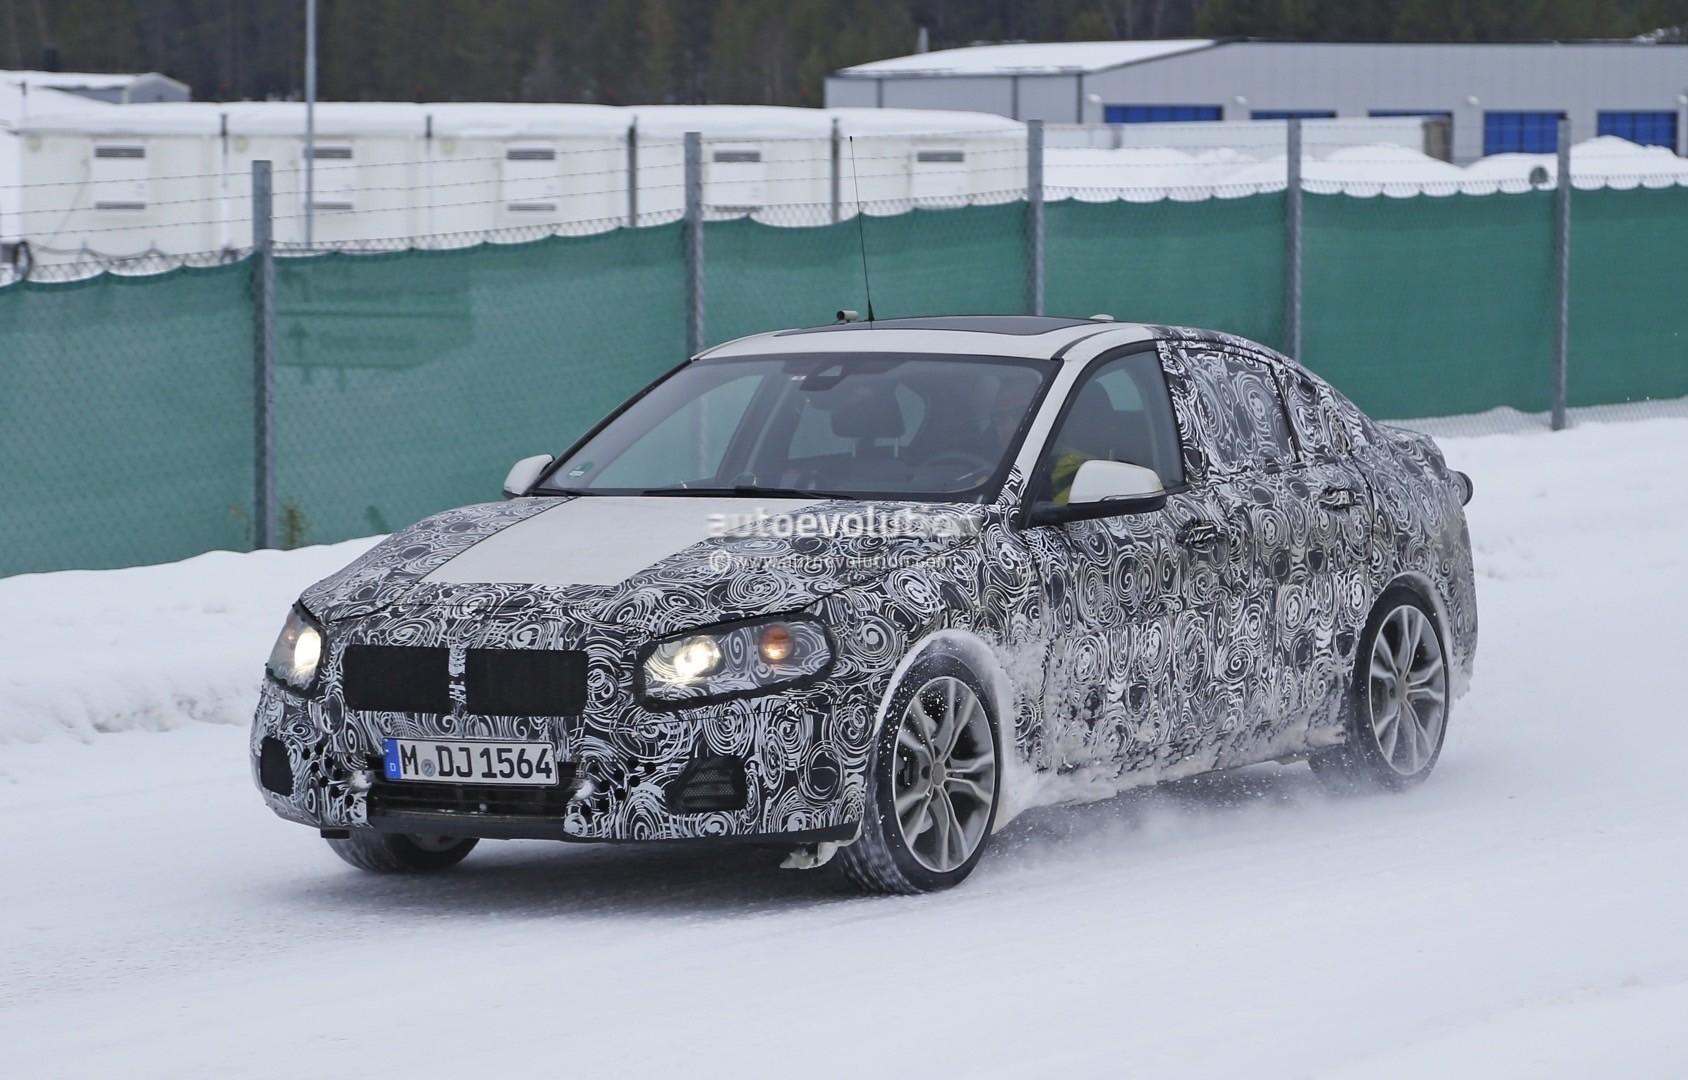 2016 - [BMW] Série 1 Sedan [F52] - Page 3 2016-bmw-f52-1-series-sedan-spotted-winter-testing-photo-gallery_2